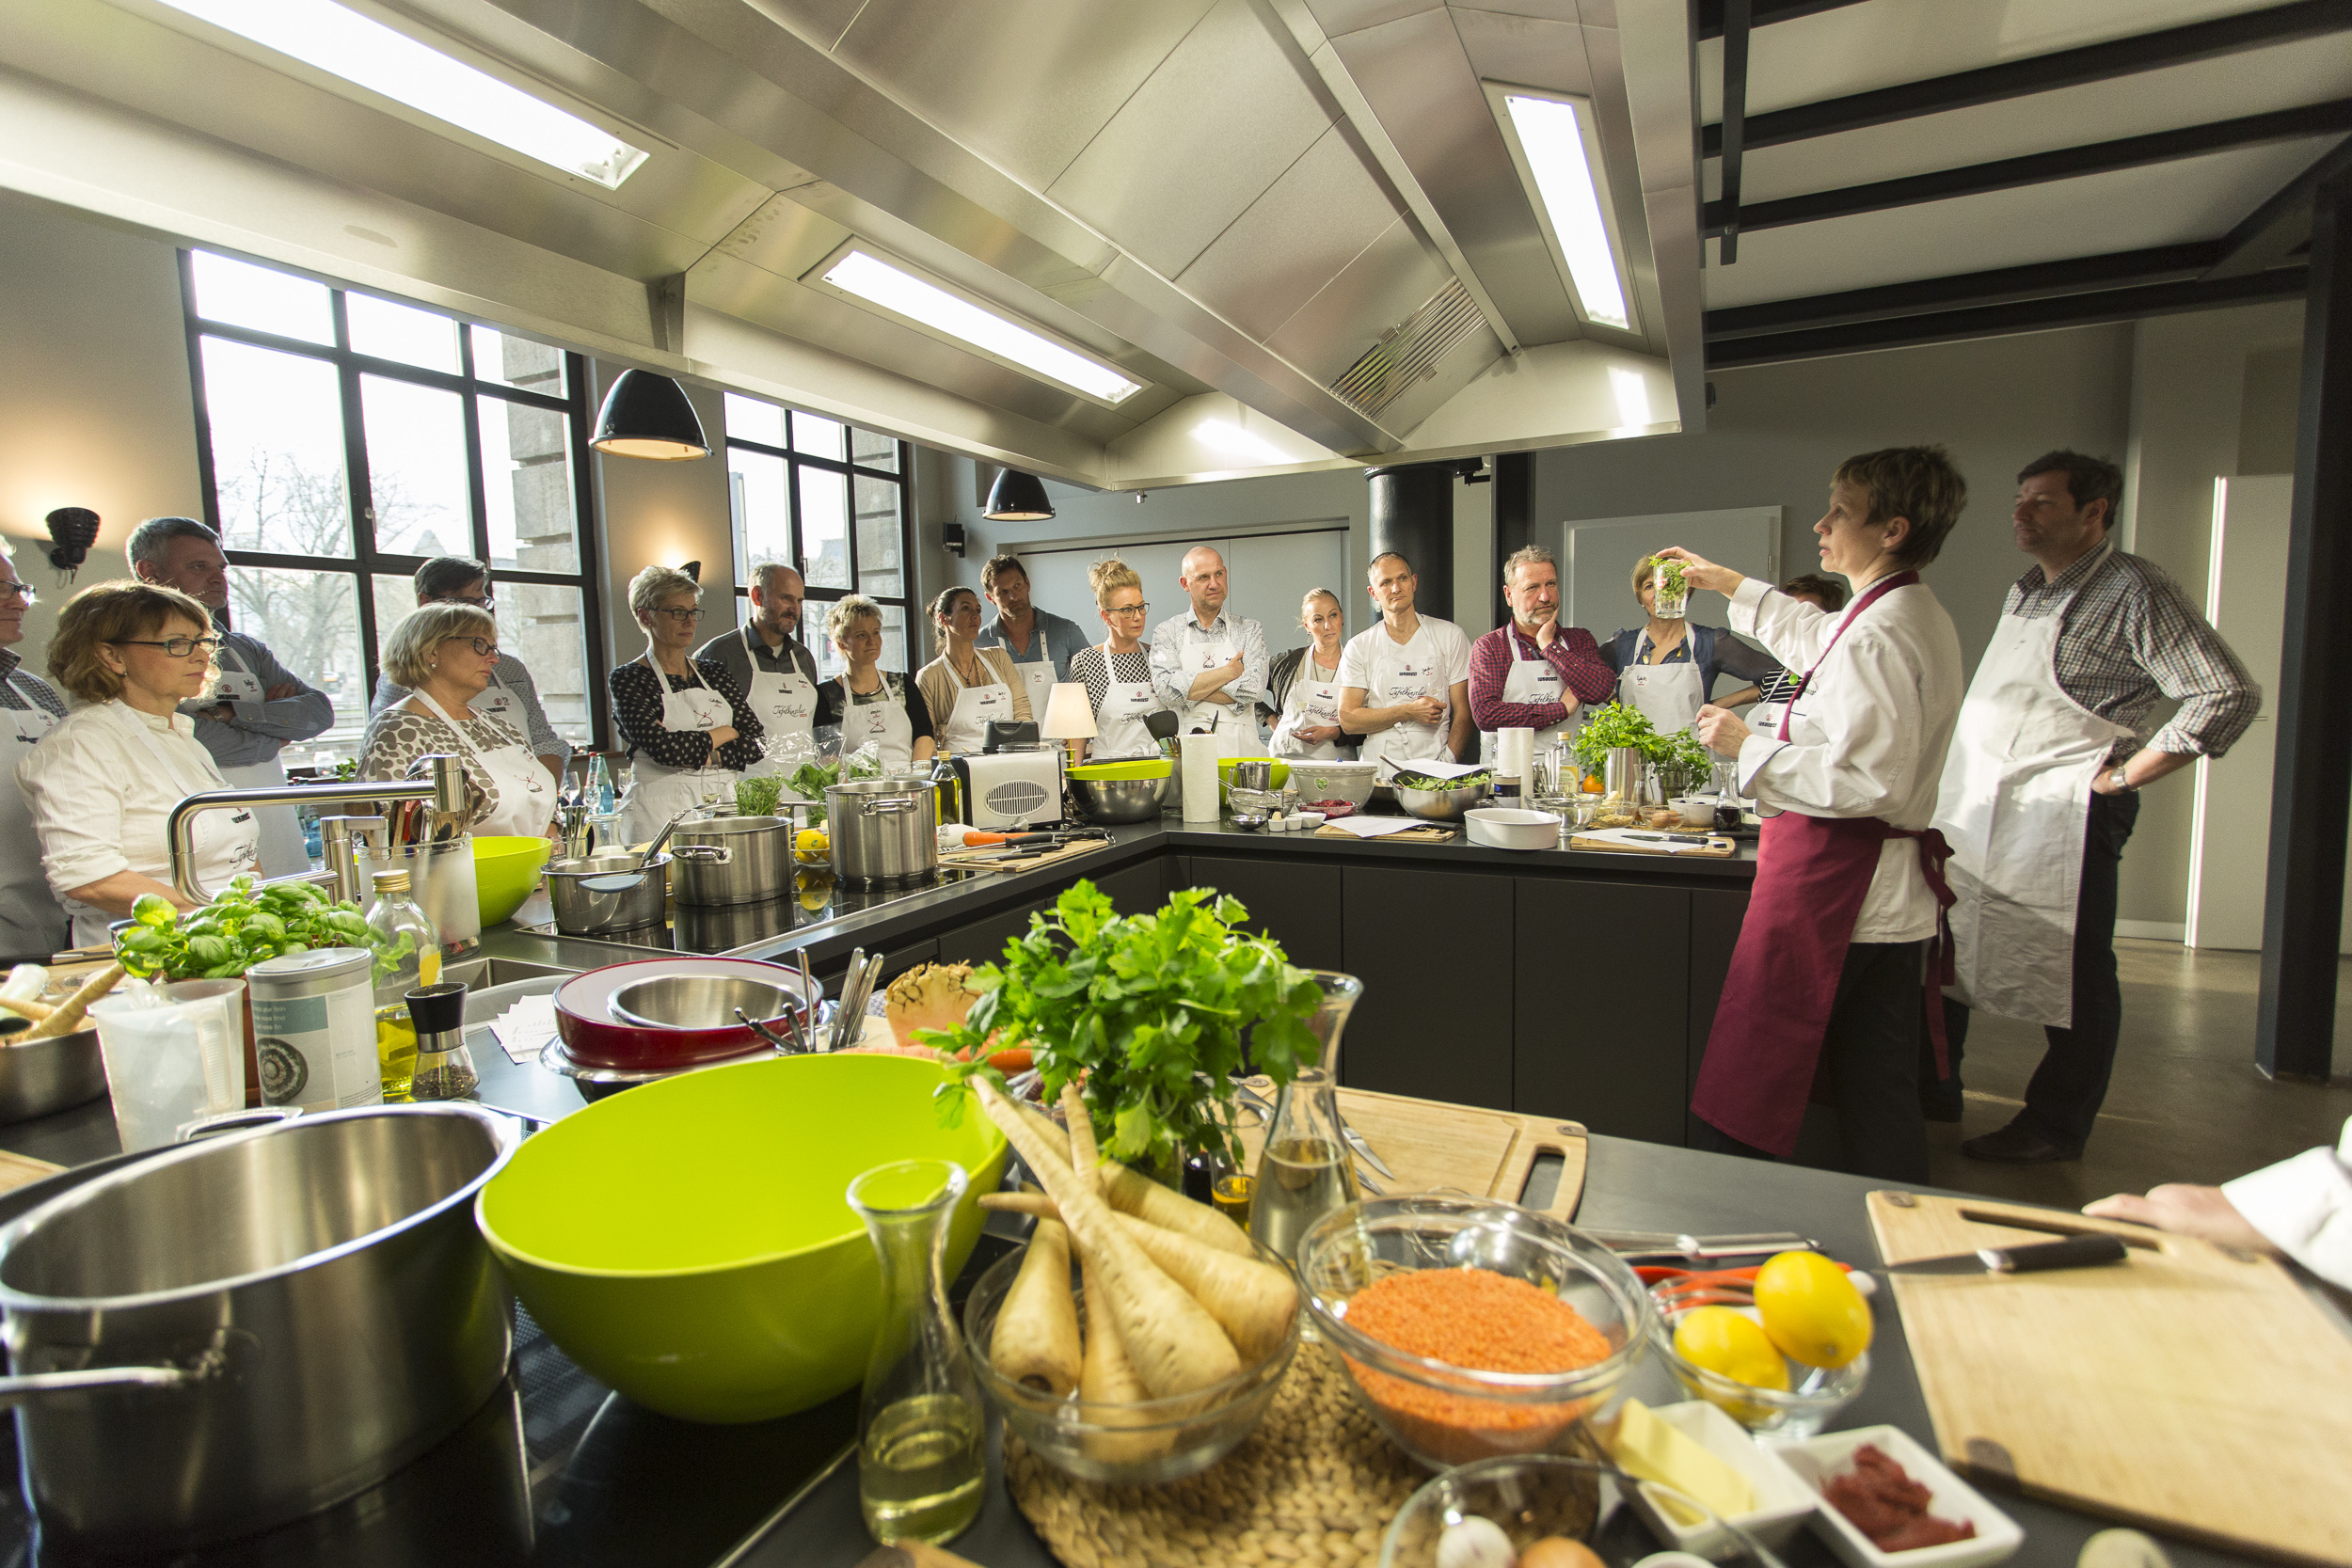 Kochschule LukullusT